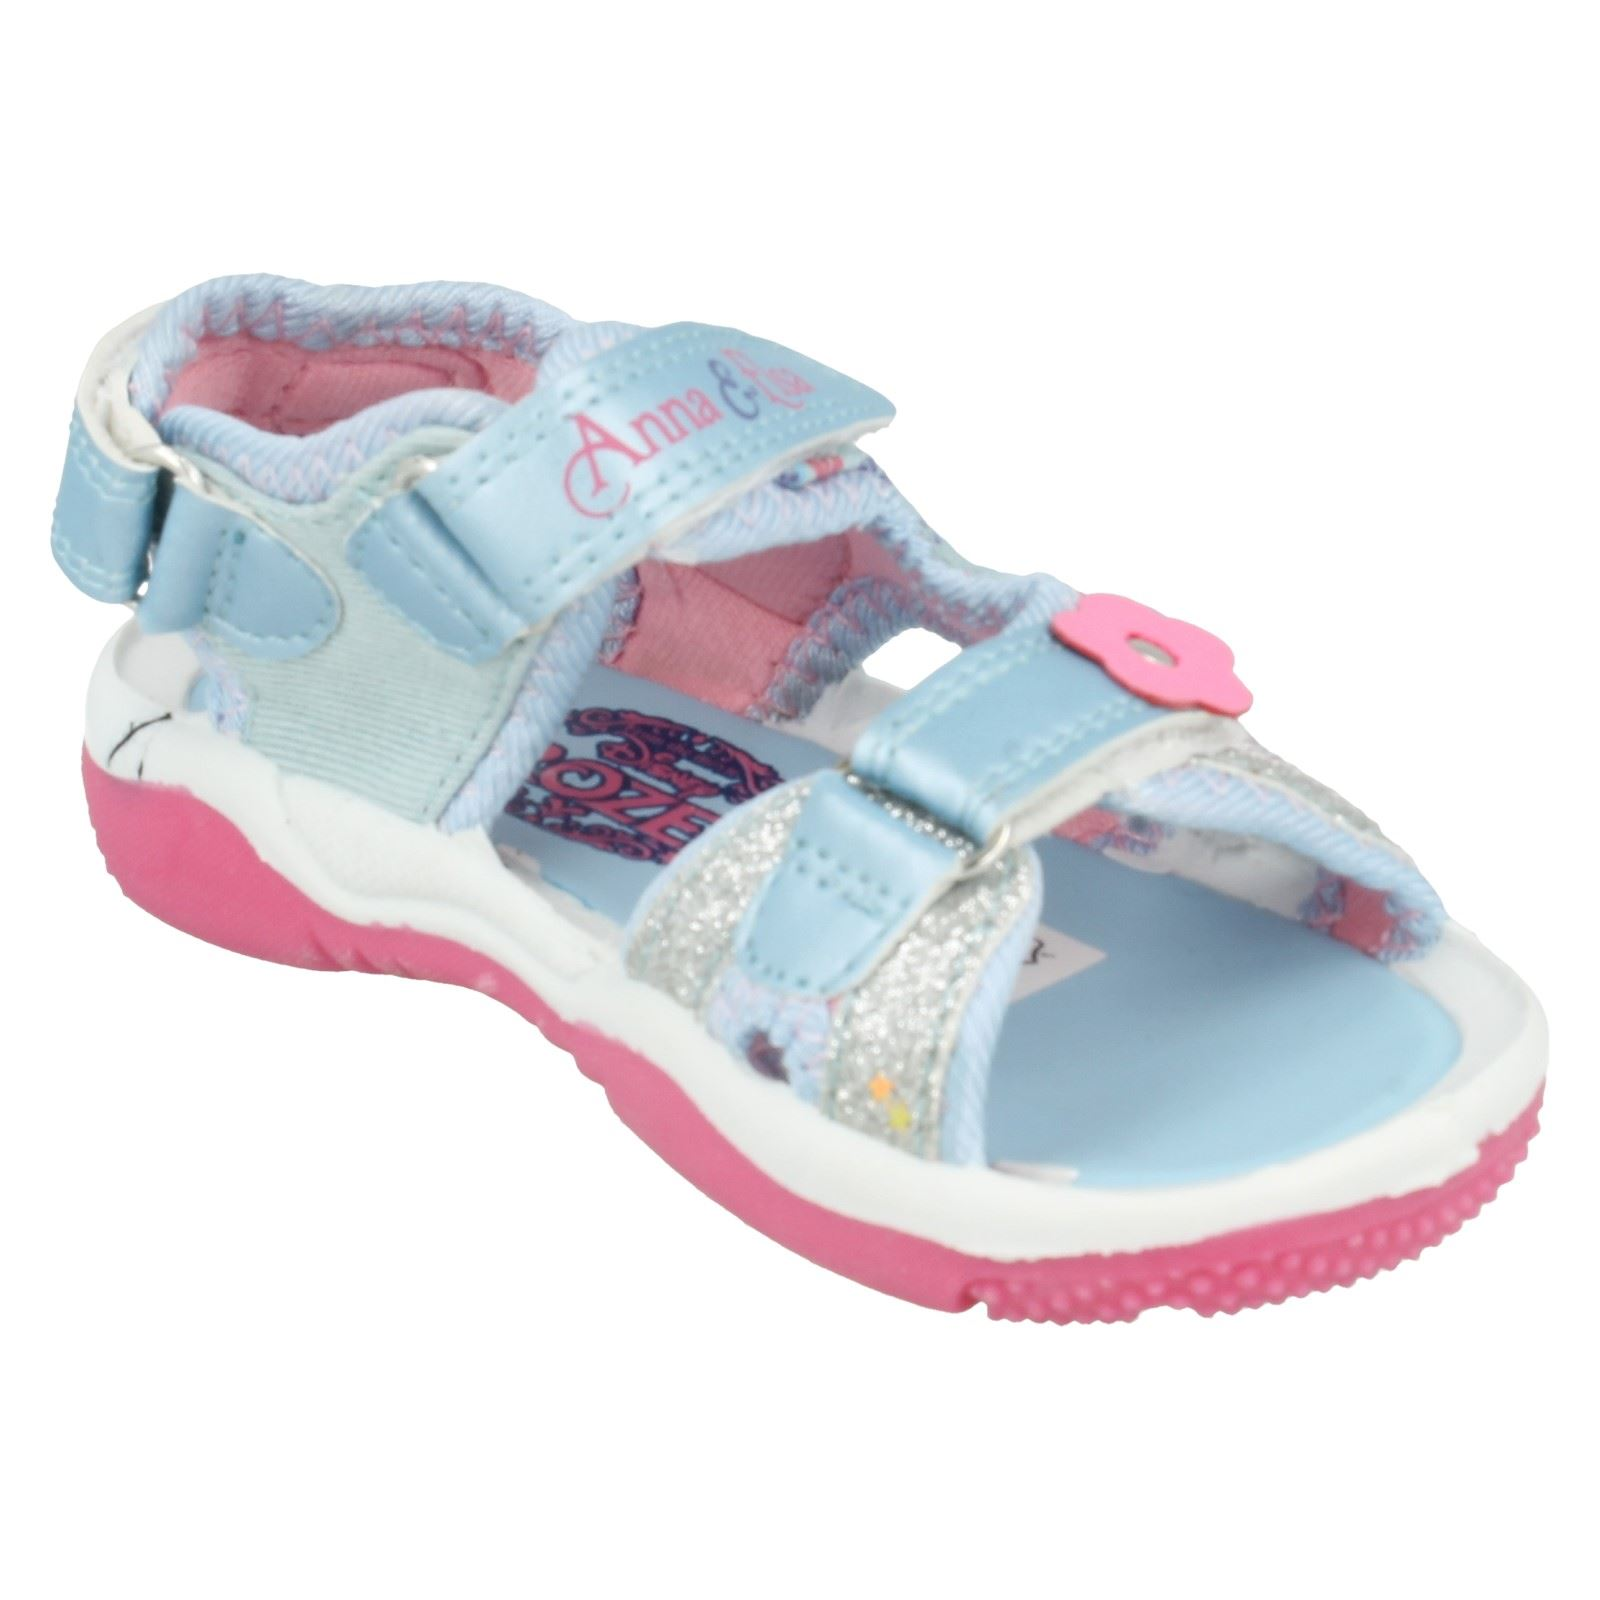 Girls Frozen Sandals Chambray Floral Sports Sandals